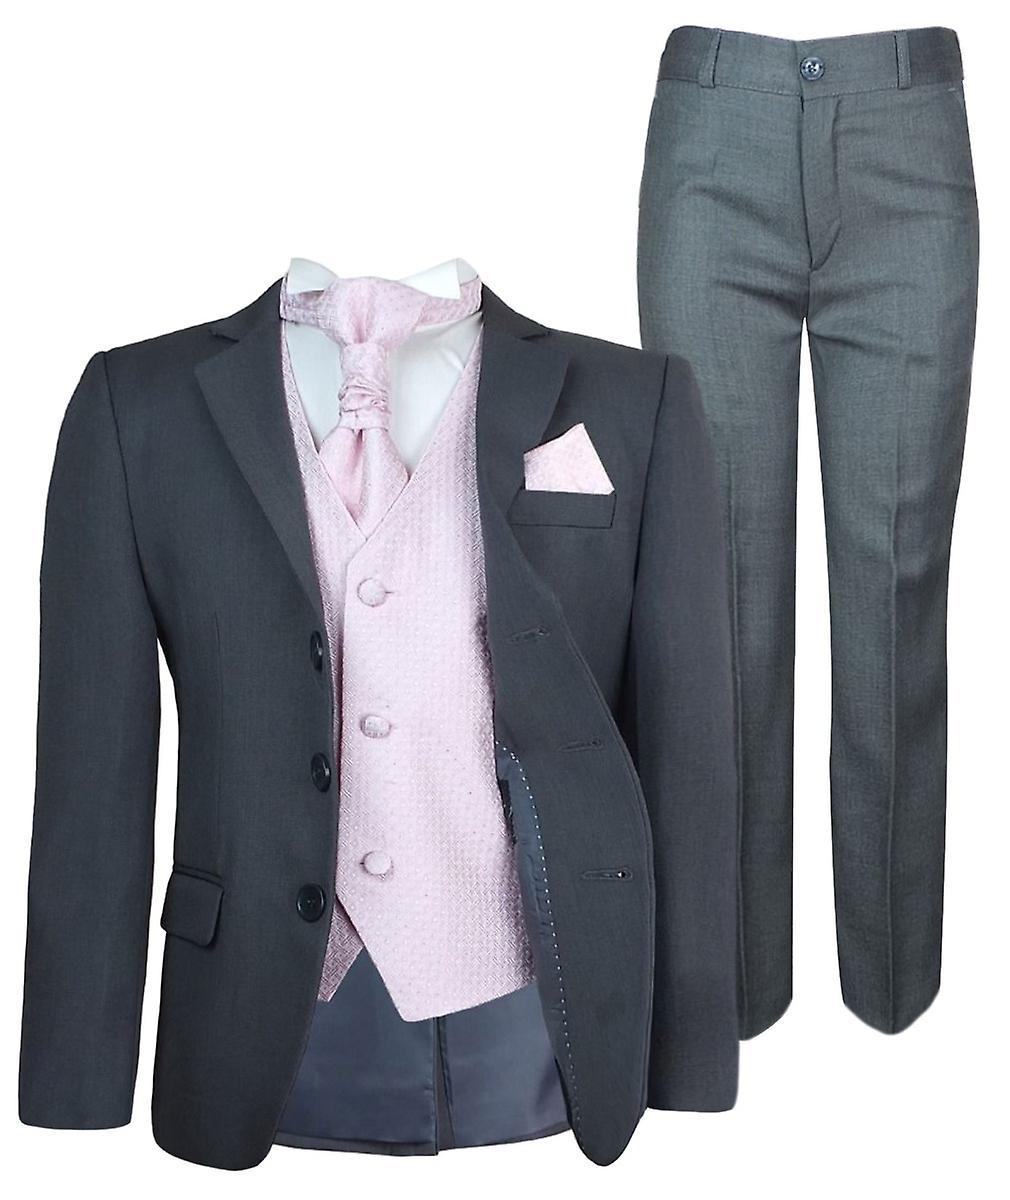 Boys New 5 Pc Grey & Pink Wedding Cravat Suit